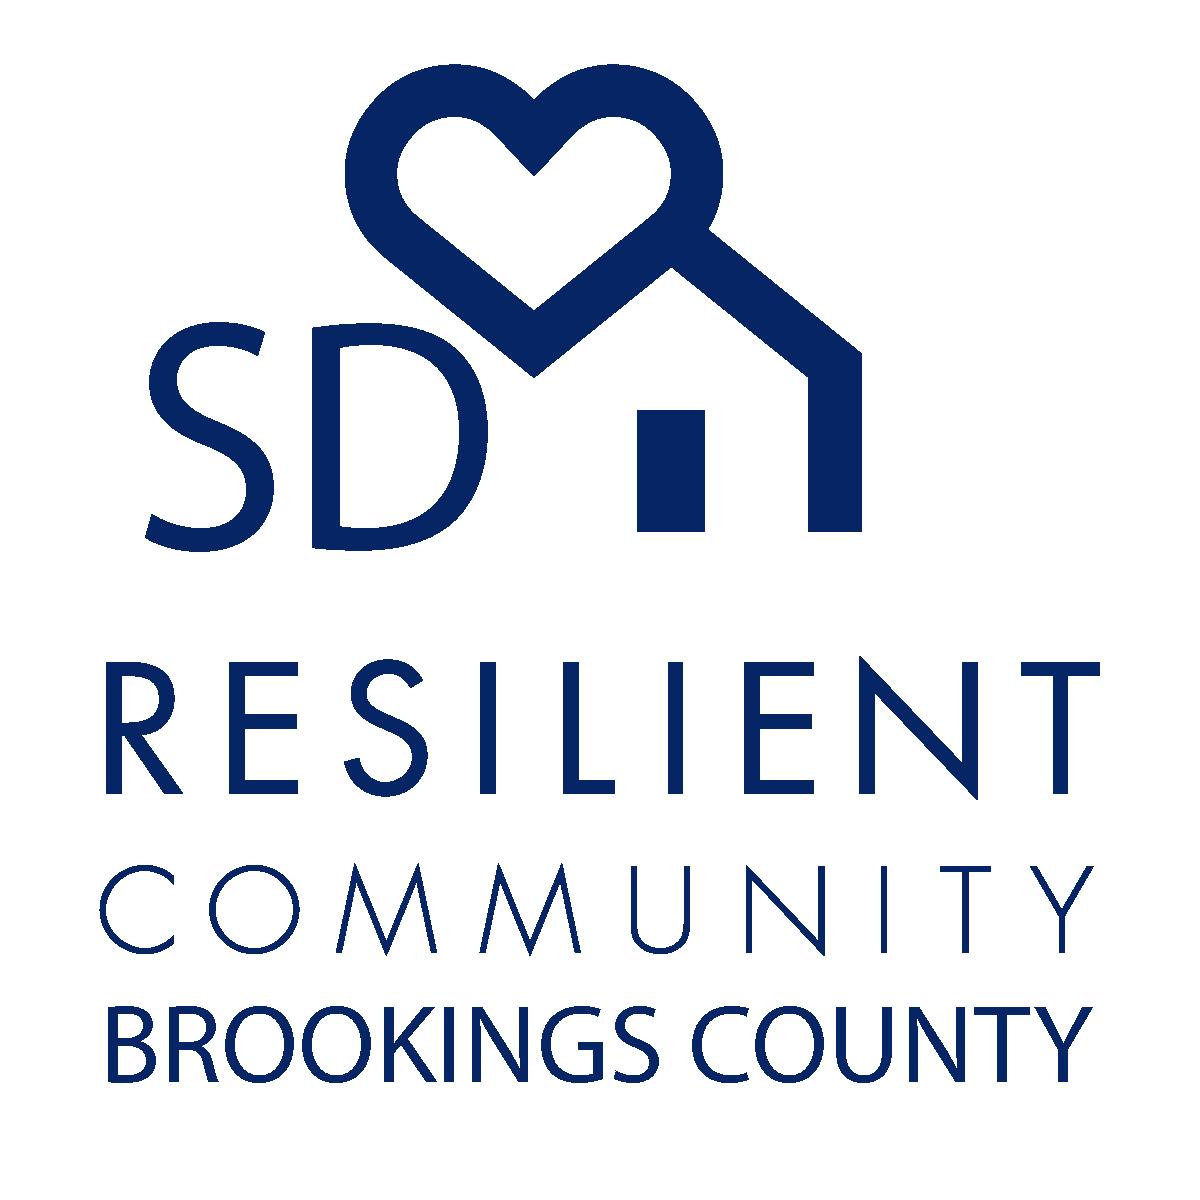 SDResilientCommunityBrookingsCounty-1.png